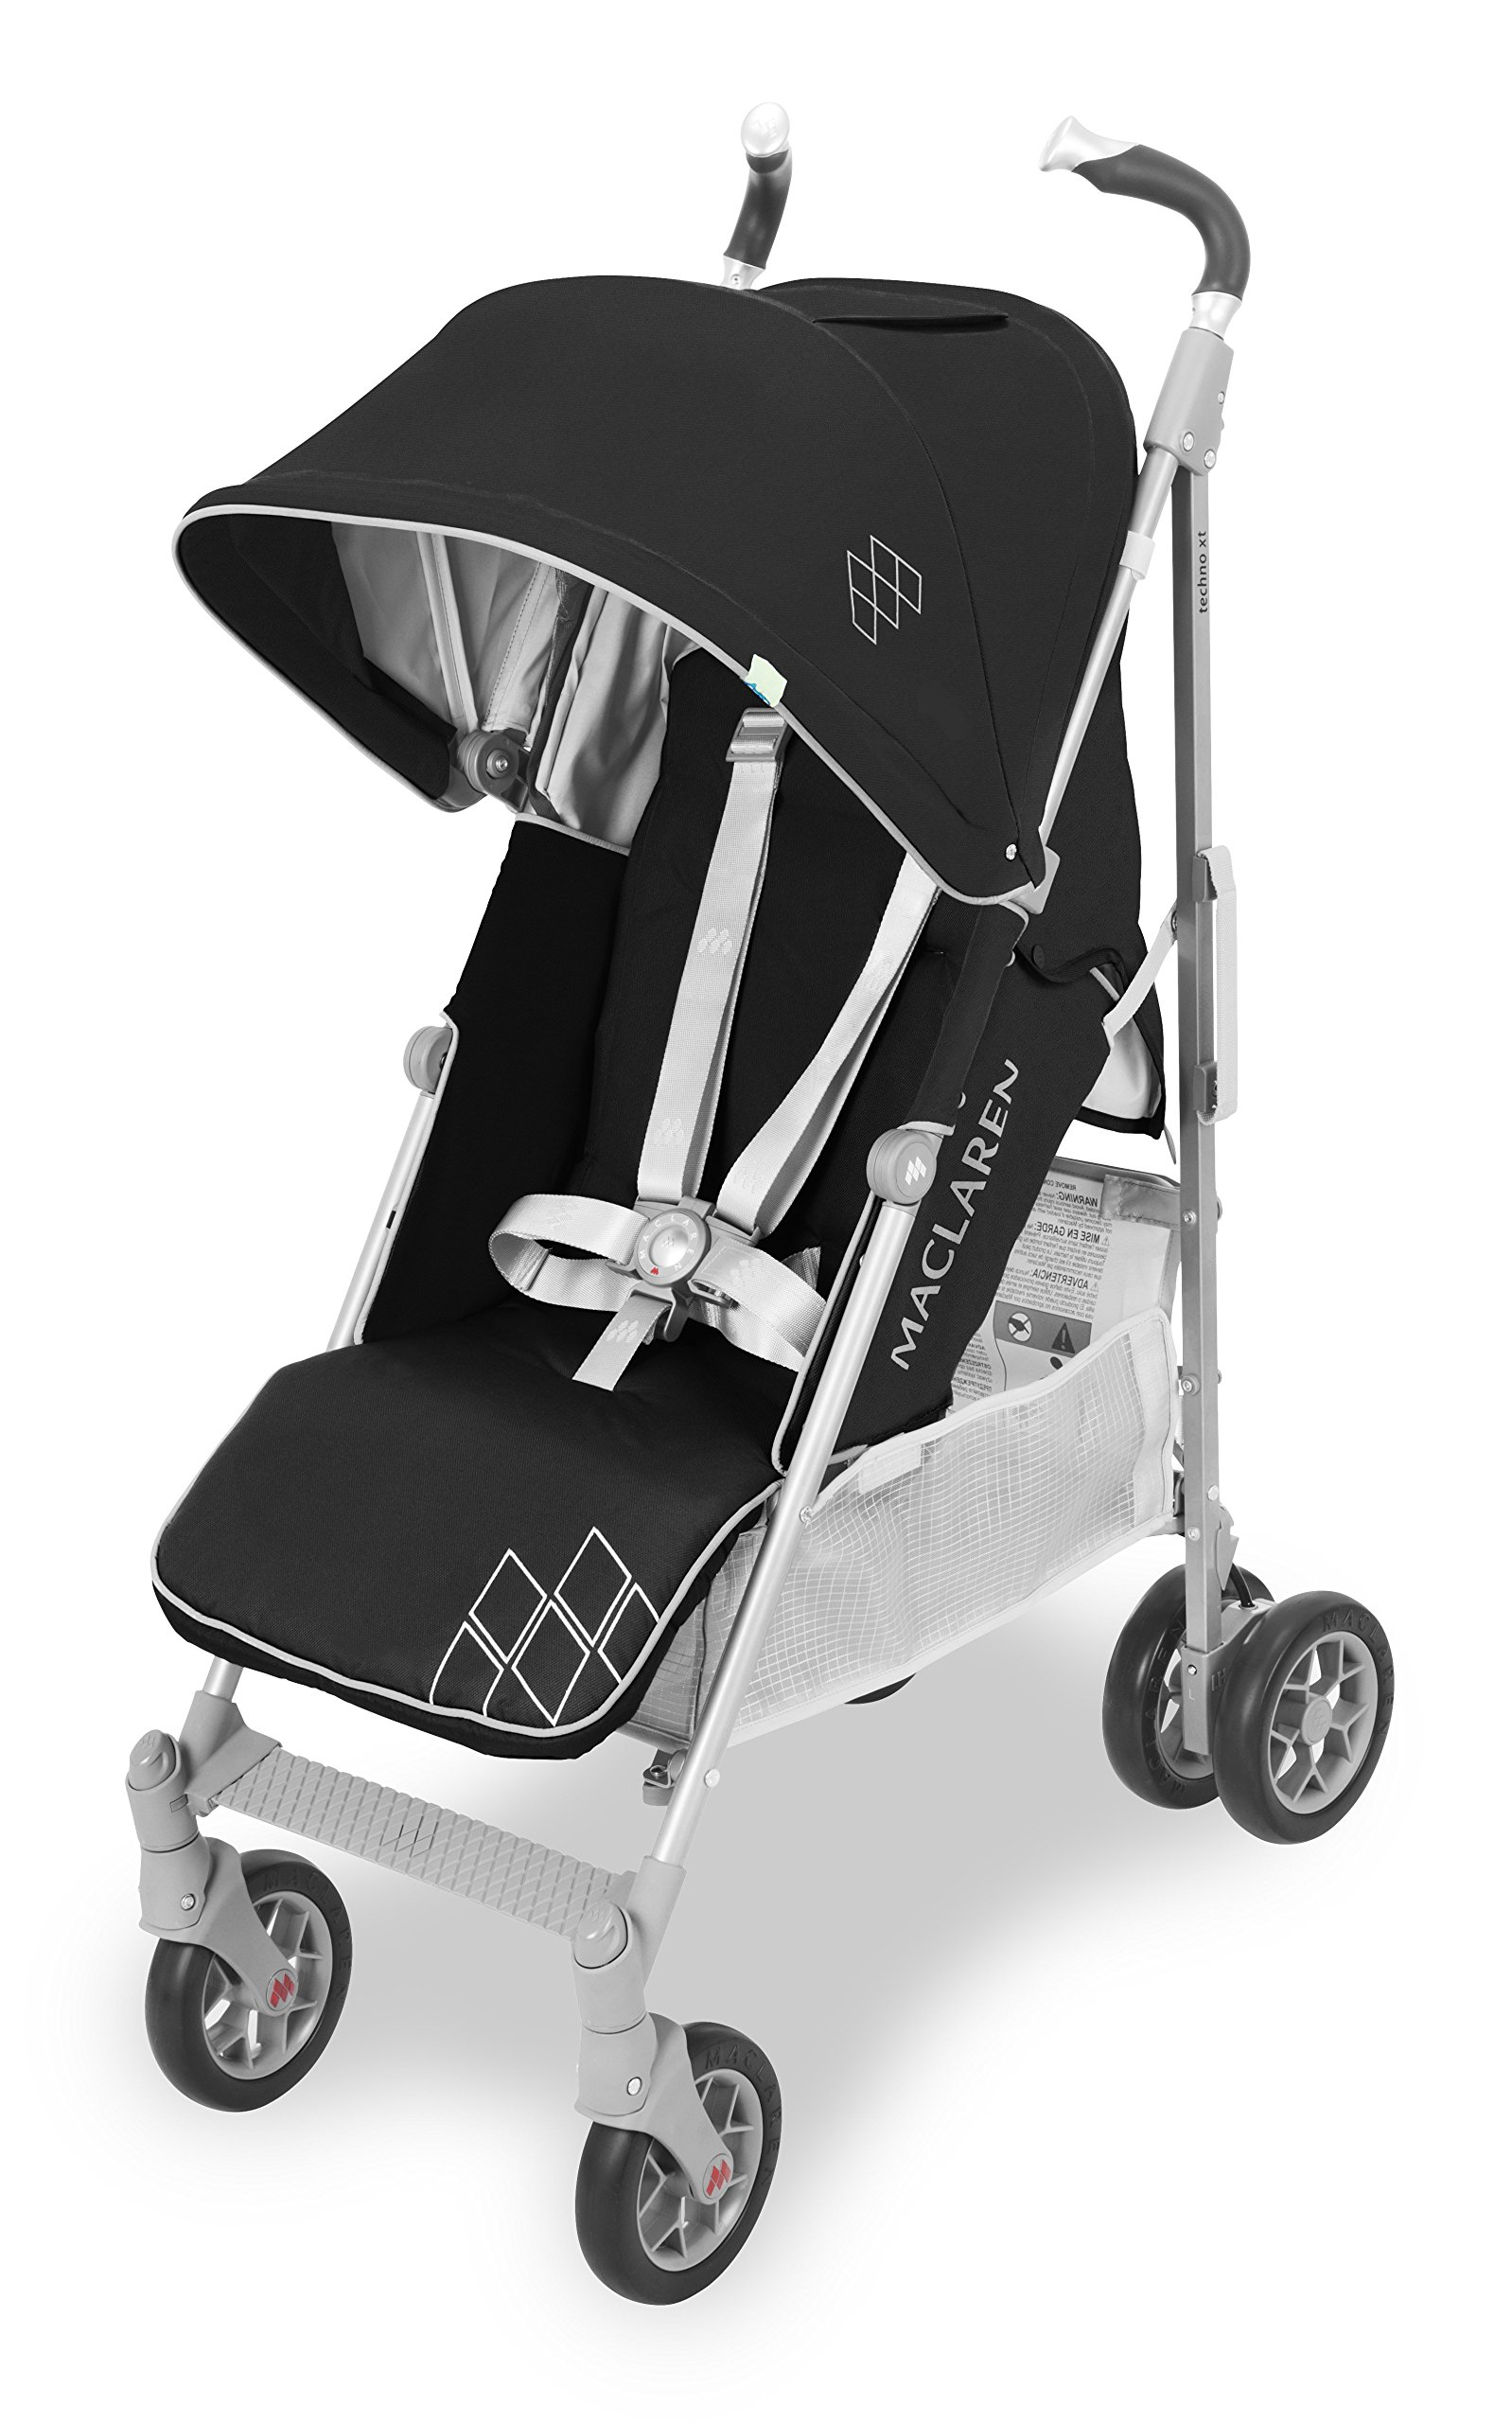 Maclaren Techno XT Silla de paseo - ligera, compacta - Negro/Plata product image